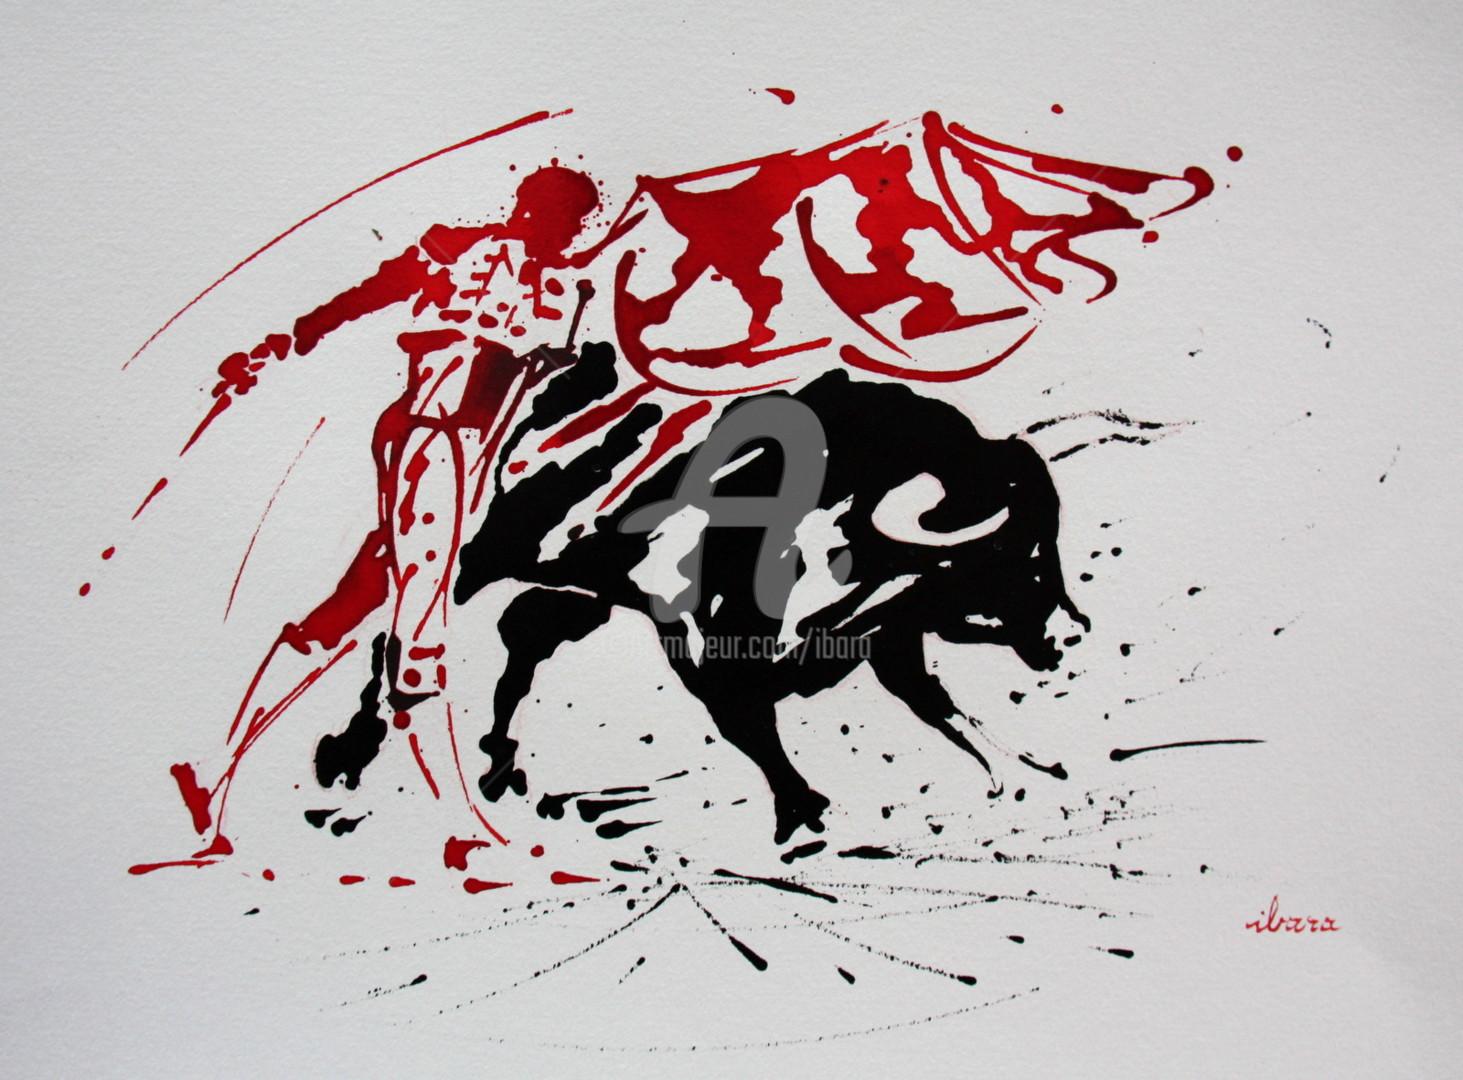 Henri Ibara - Tauromachie N°1